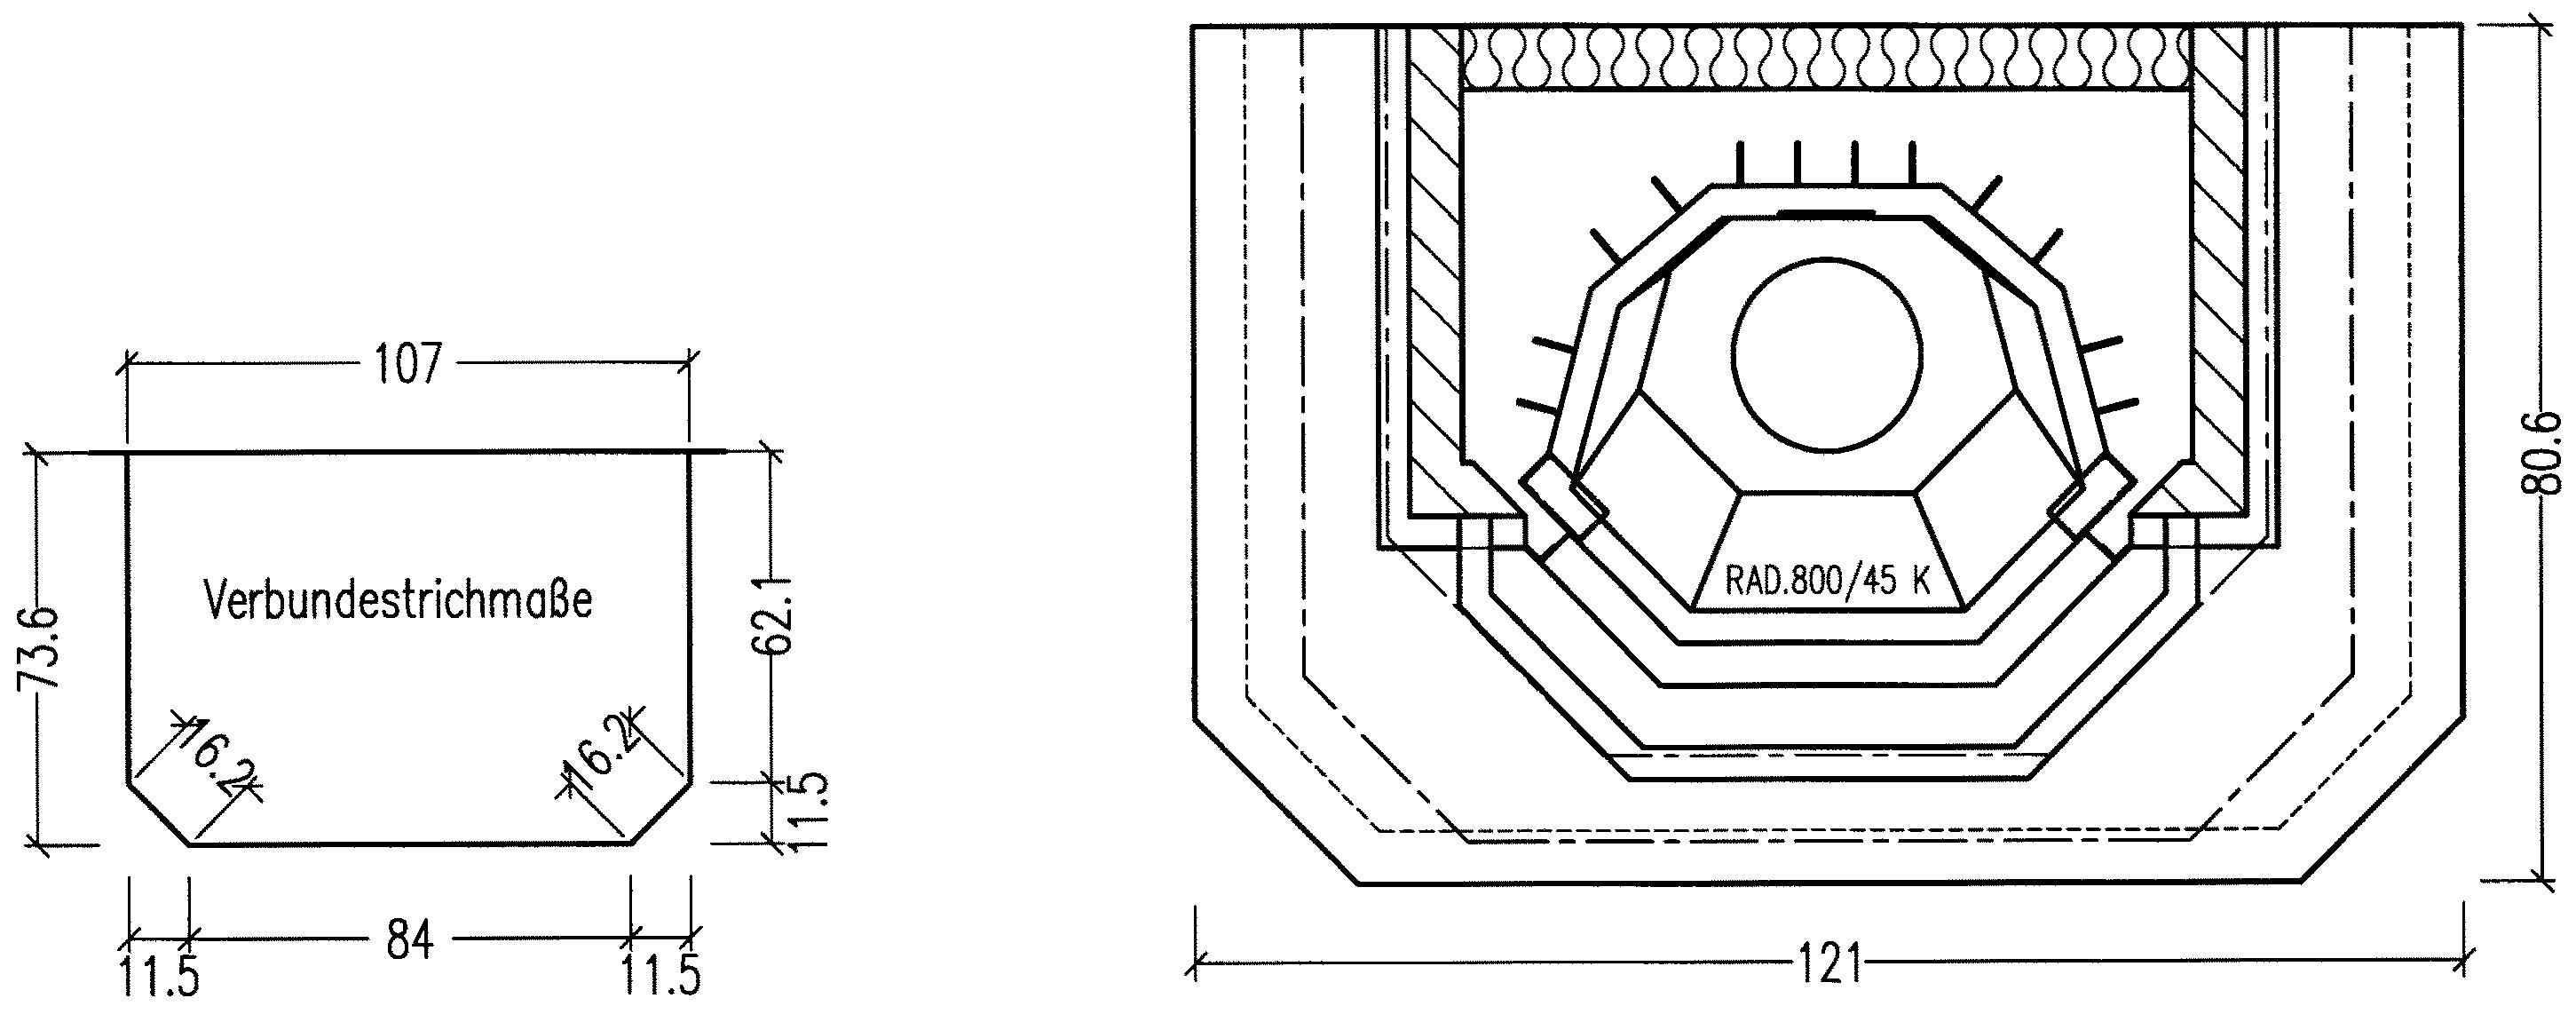 Kaminbausatz Hark Aspen mit Radiante 800/45K Marmor Classico-Beige 8kW Bild 3